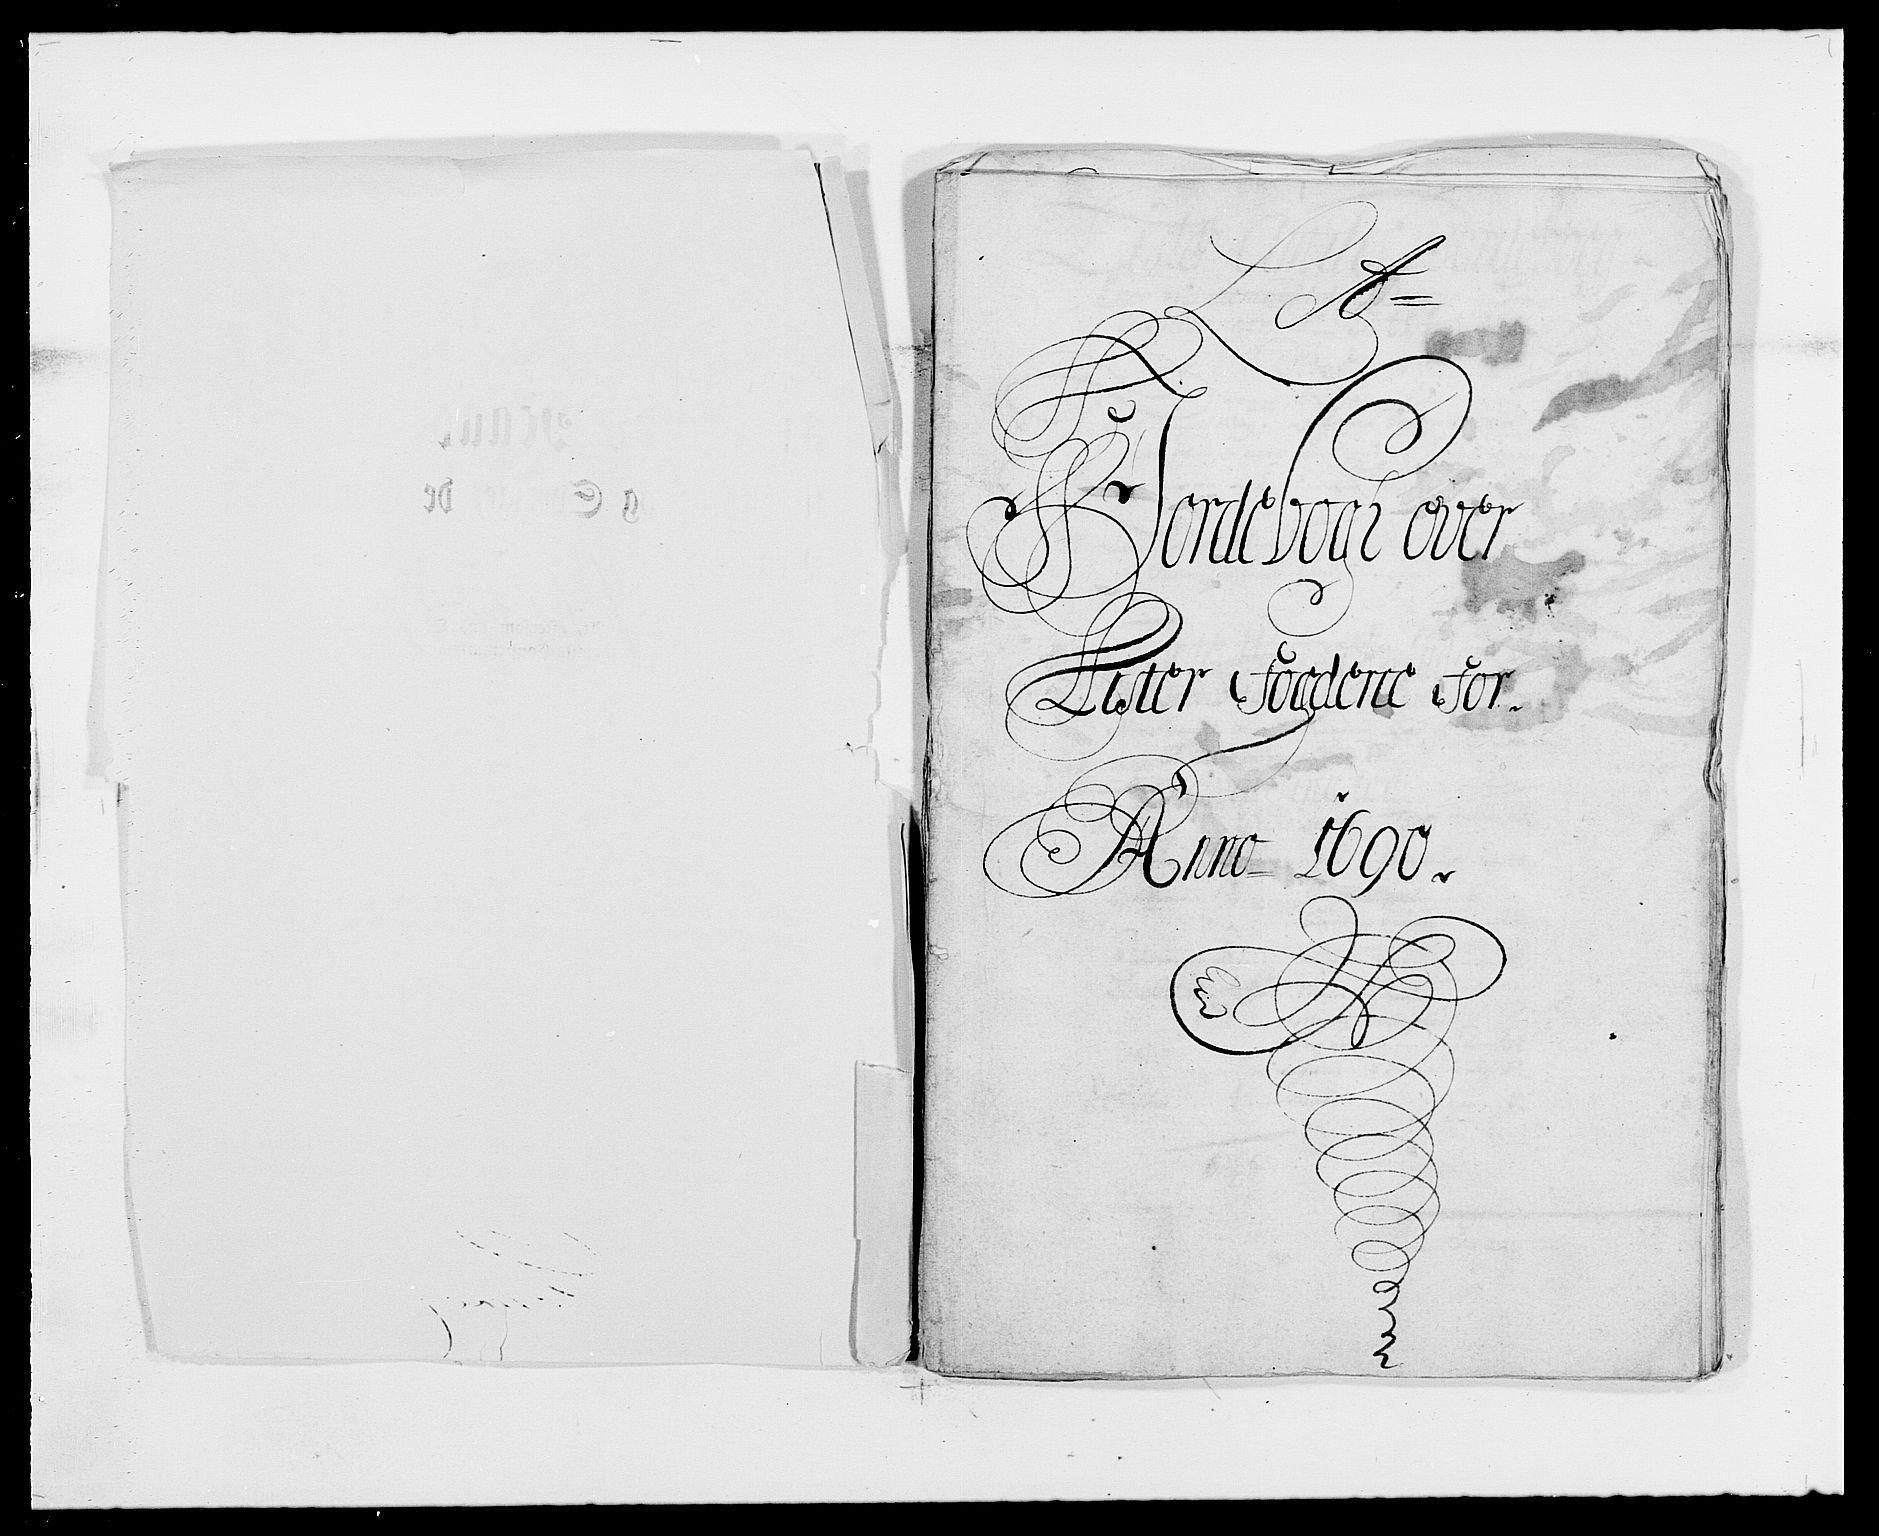 RA, Rentekammeret inntil 1814, Reviderte regnskaper, Fogderegnskap, R41/L2536: Fogderegnskap Lista, 1690-1693, s. 33